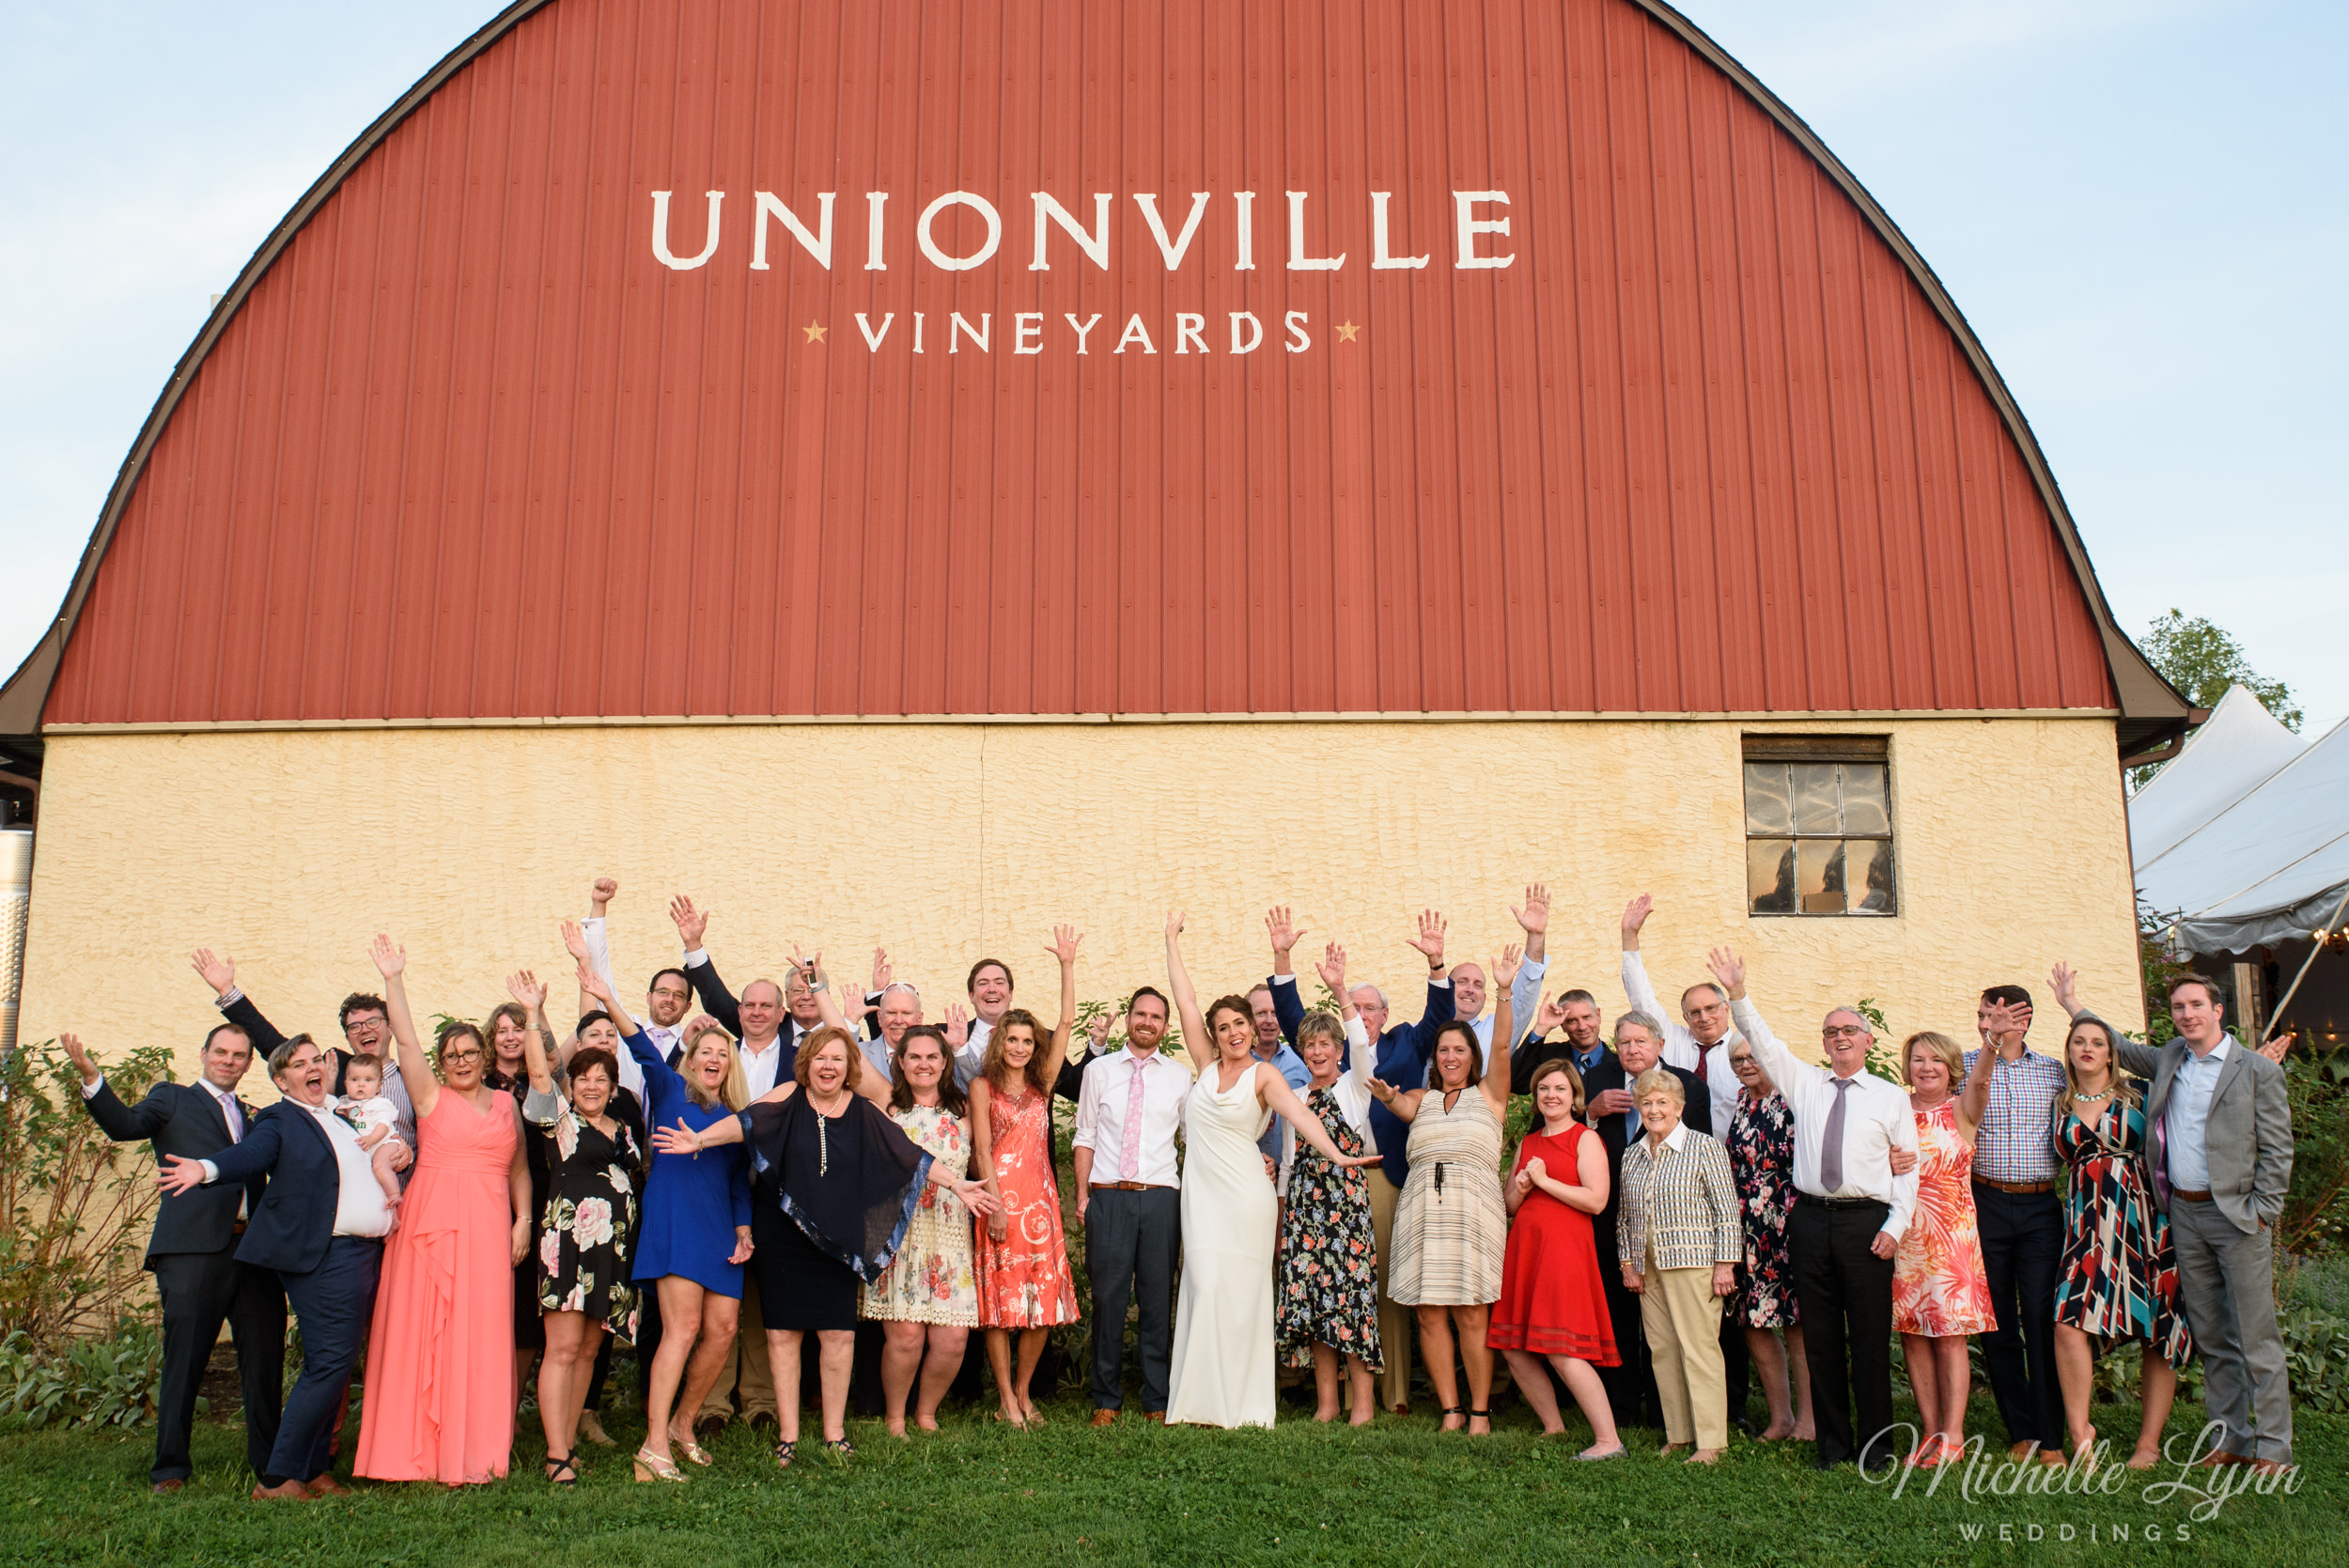 mlw-unionville-vineyards-nj-wedding-photography-68.jpg